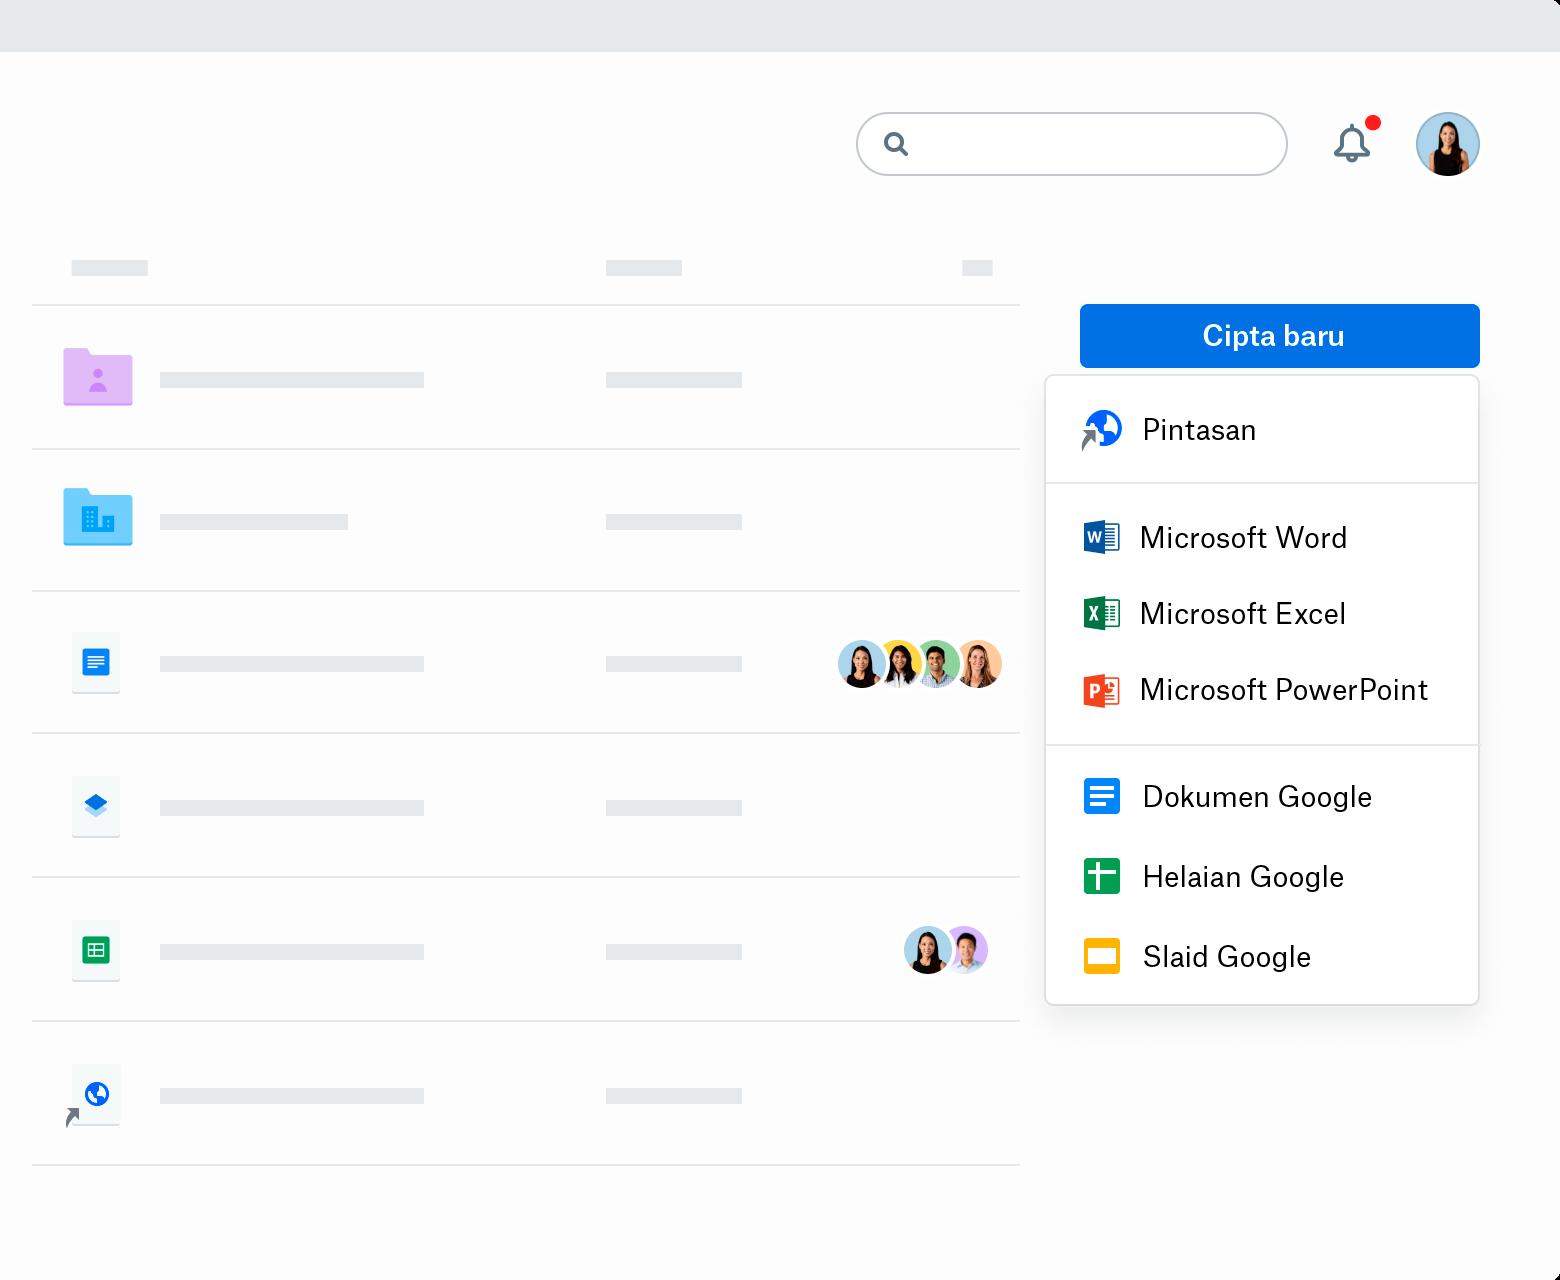 "Tangkapan skrin menu juntai bawah ""Cipta baharu"" dalam Dropbox.com. Menu ini menyenaraikan Pintasan, Microsoft Word, Microsoft Excel, Microsoft PowerPoint, Google Docs, Google Sheets dan Google Slides."